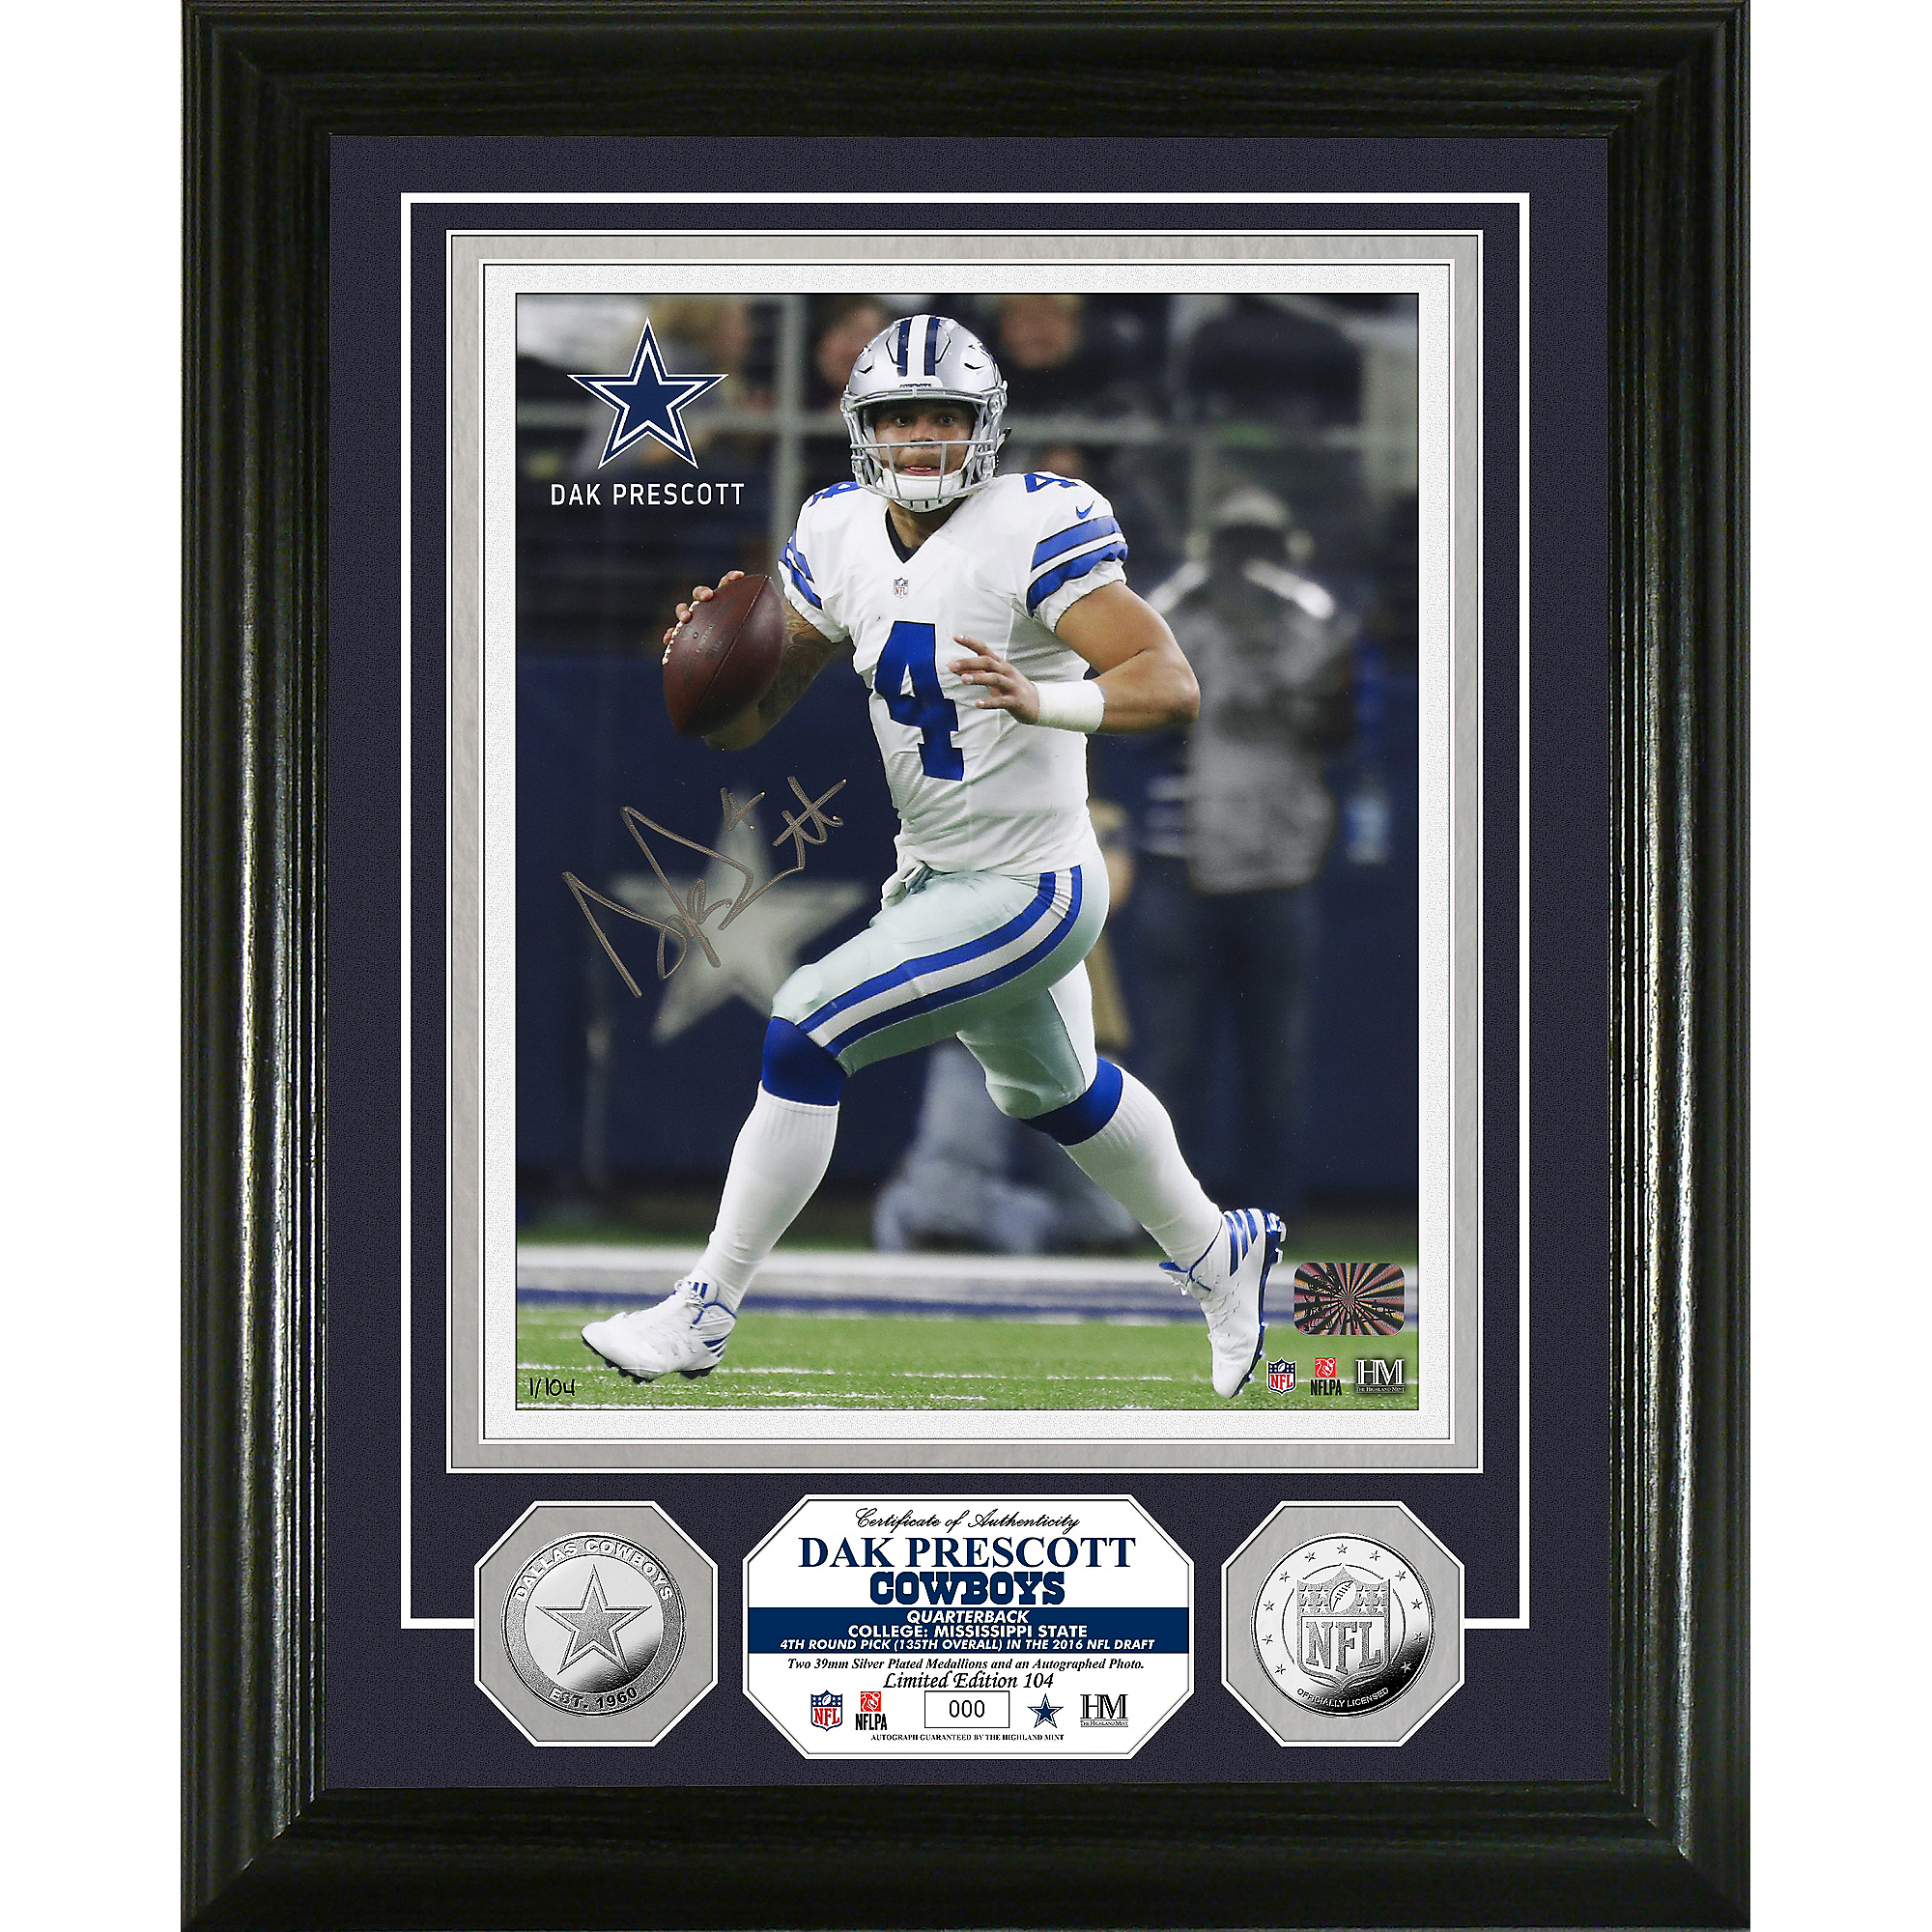 Dallas Cowboys Dak Prescott 8x10 Autographed Photo Mint